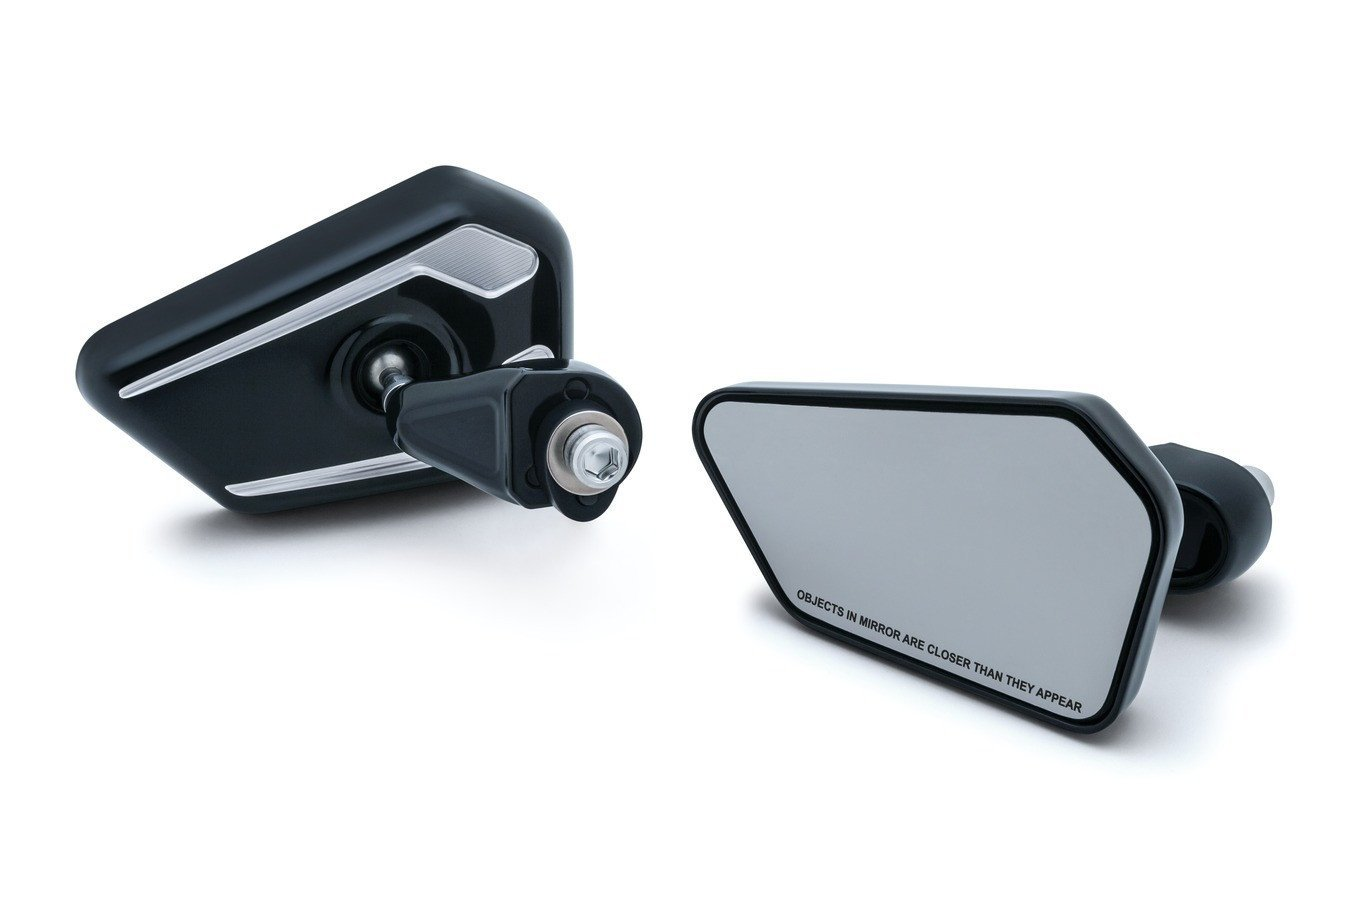 Bagger Brothers HD-MIR24K Elite Series Black Fairing Mounted Mirror for 2014 - 2018 Harley-Davidson FLH Touring Models